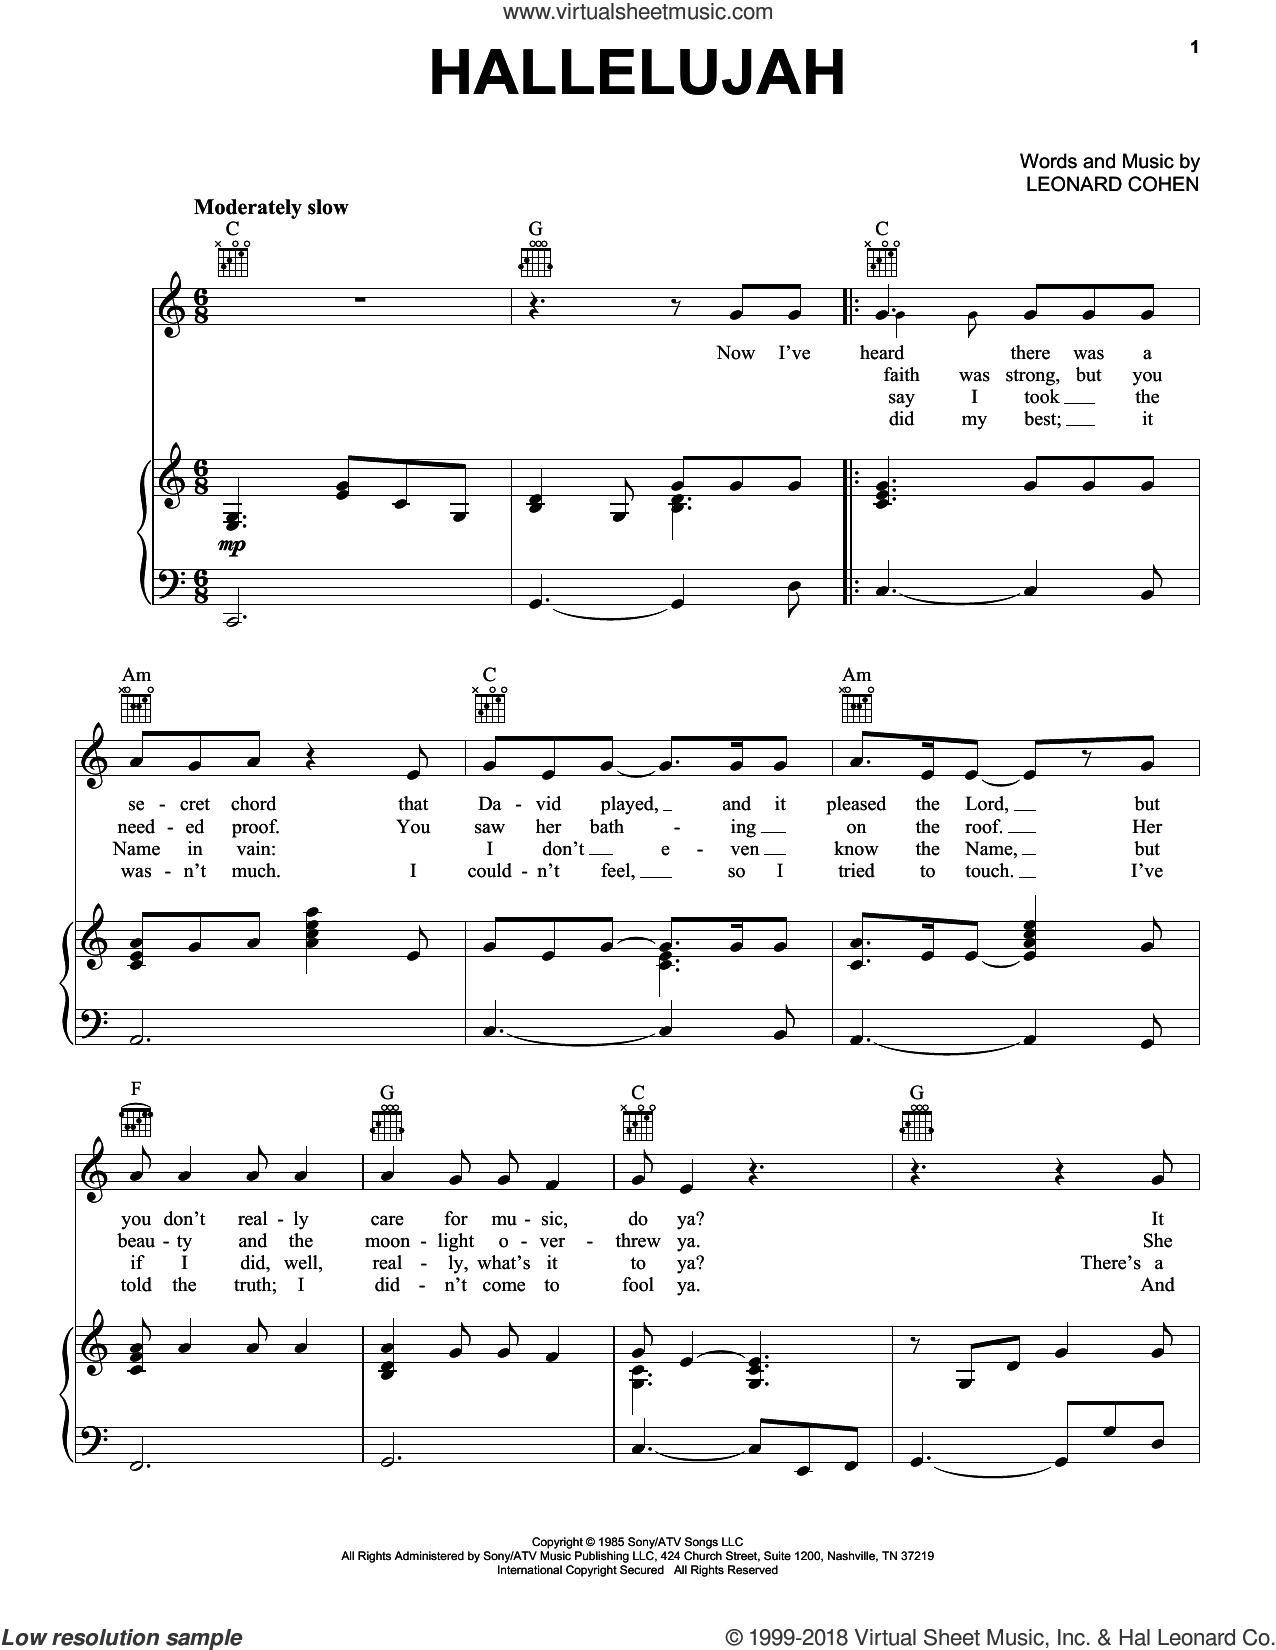 Hallelujah - Free Printable Piano Sheet Music For Hallelujah By Leonard Cohen